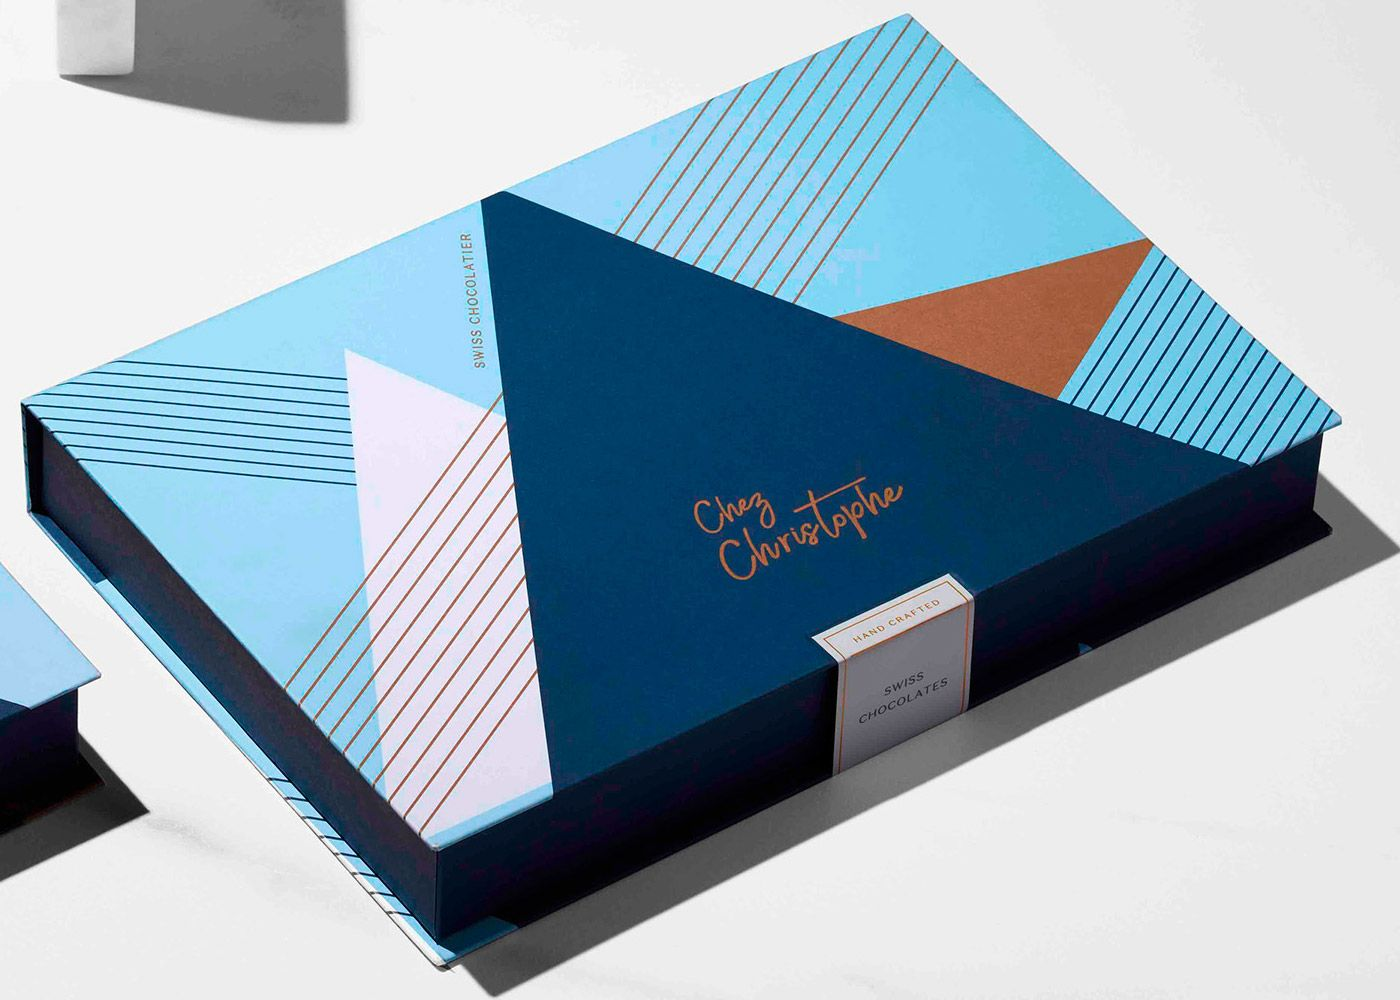 Chez Christophe Chocolates Packaging Design